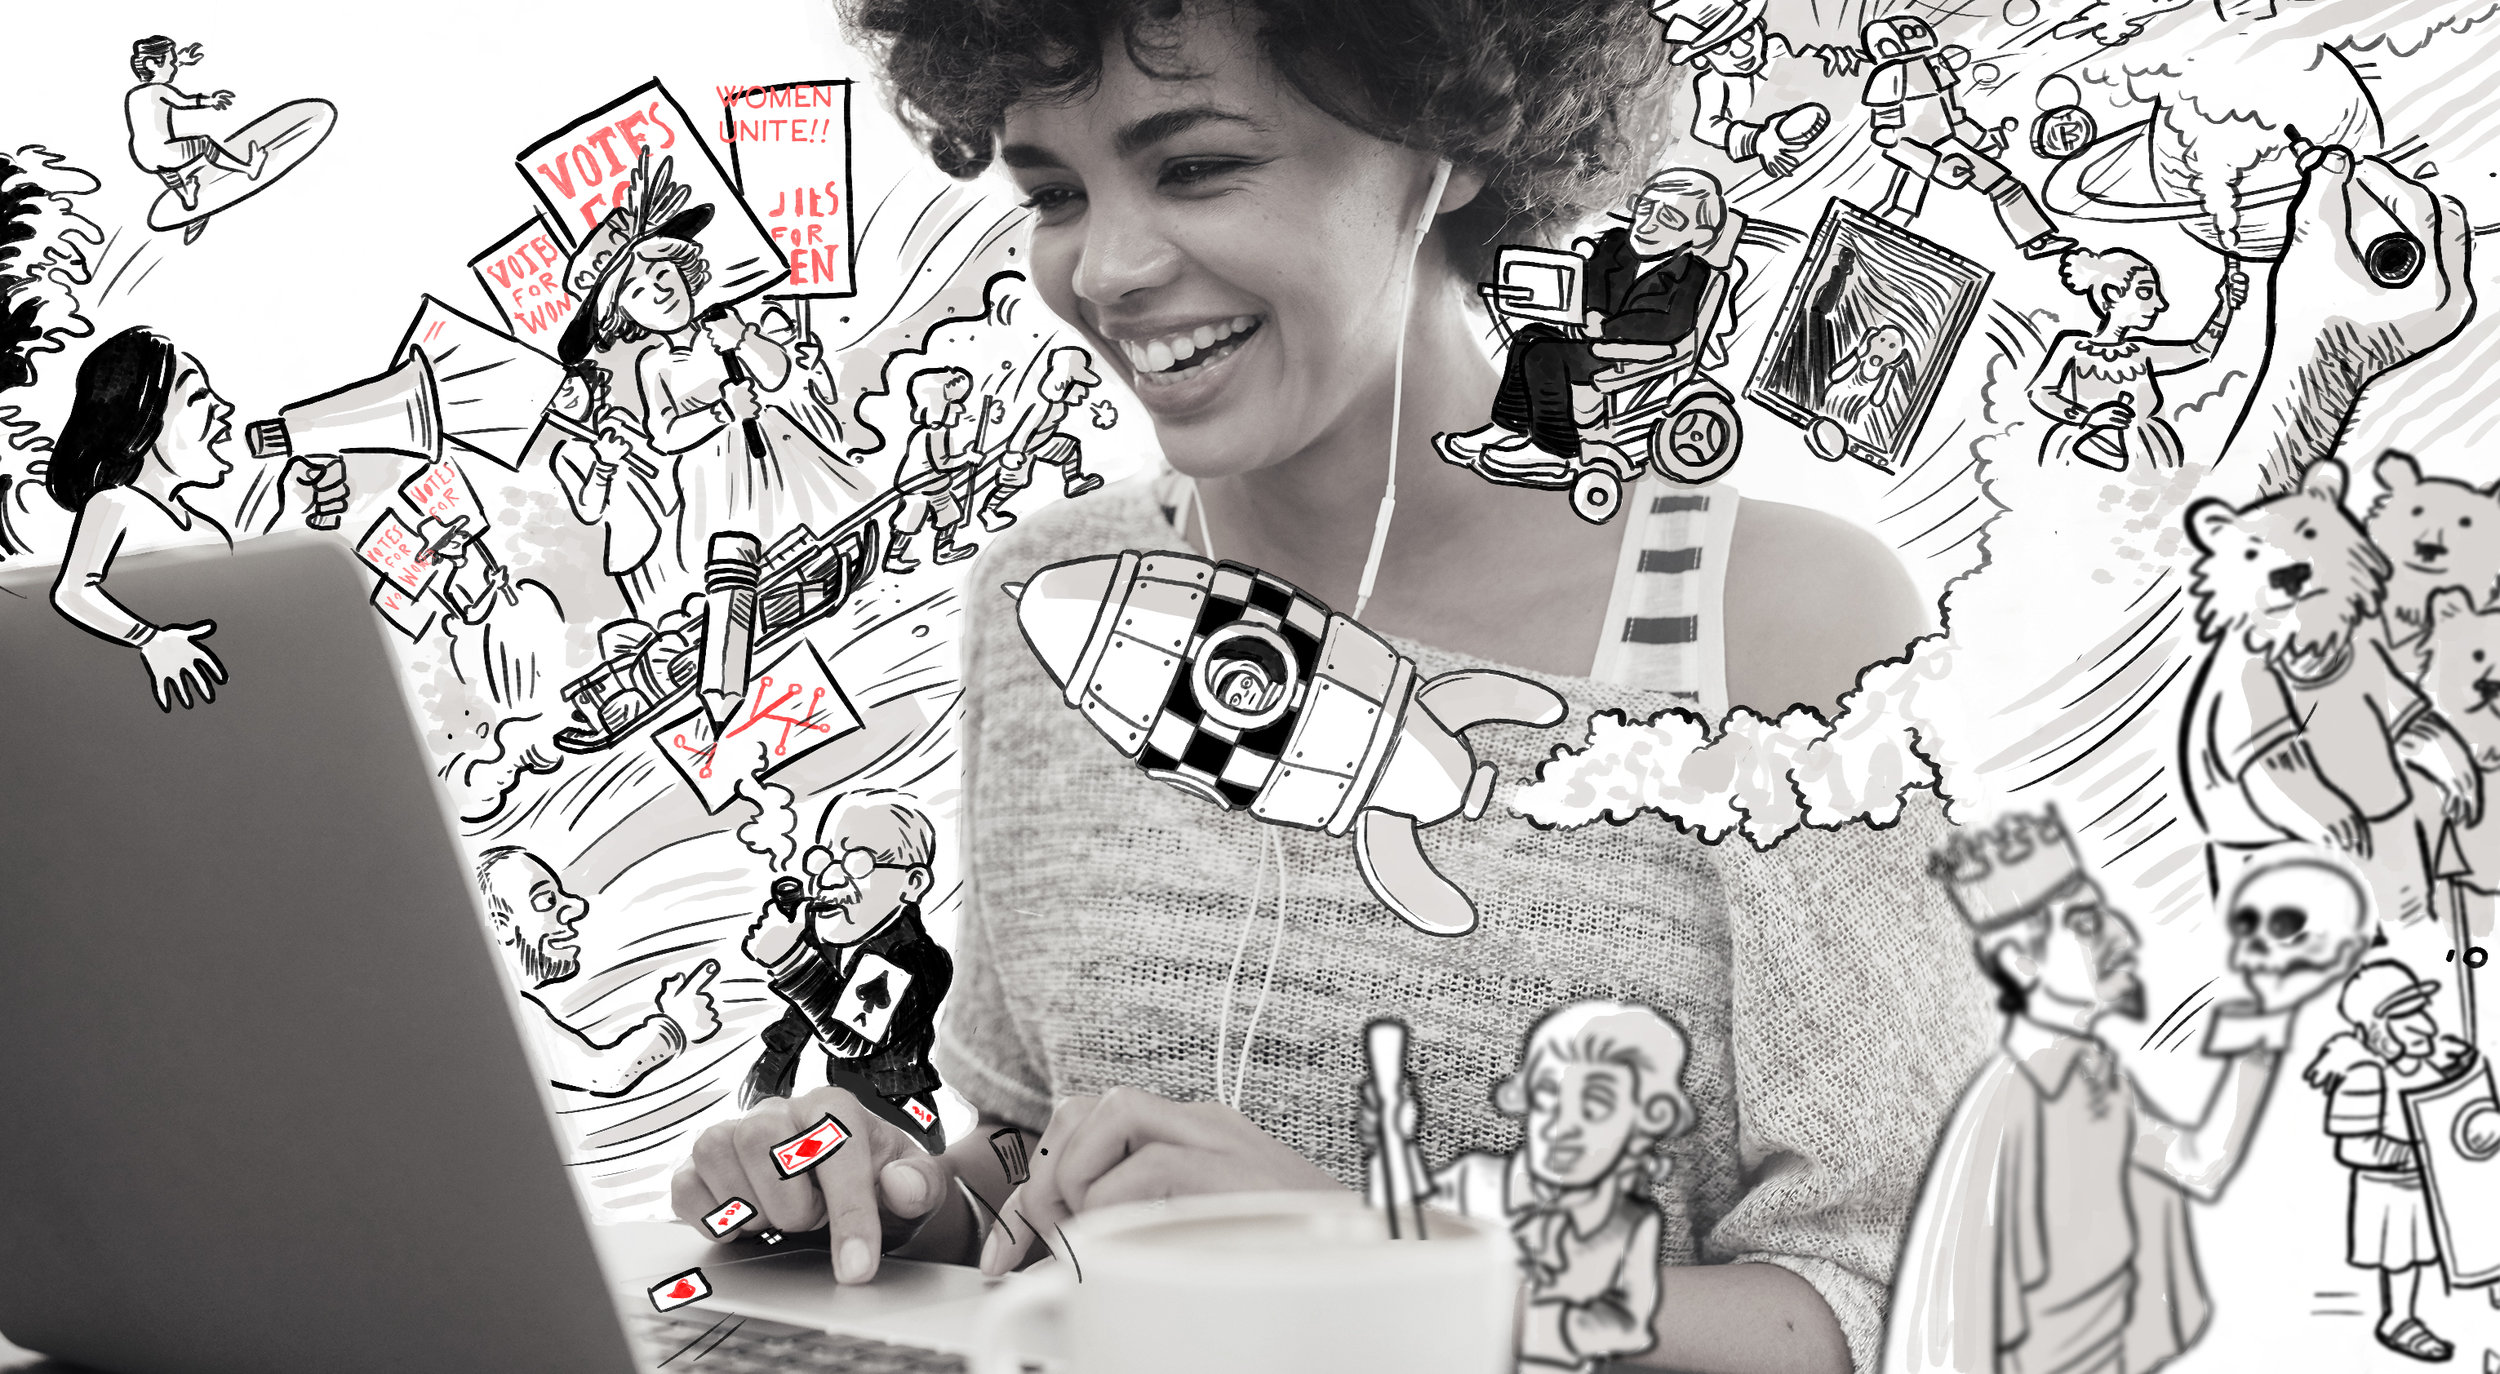 Whiteboard, Explainer, Explainer Video, Explainer Film, Whiteboard Animation, Cognitive, Award Winning, We Are Cognitive, Marketing, Social Media